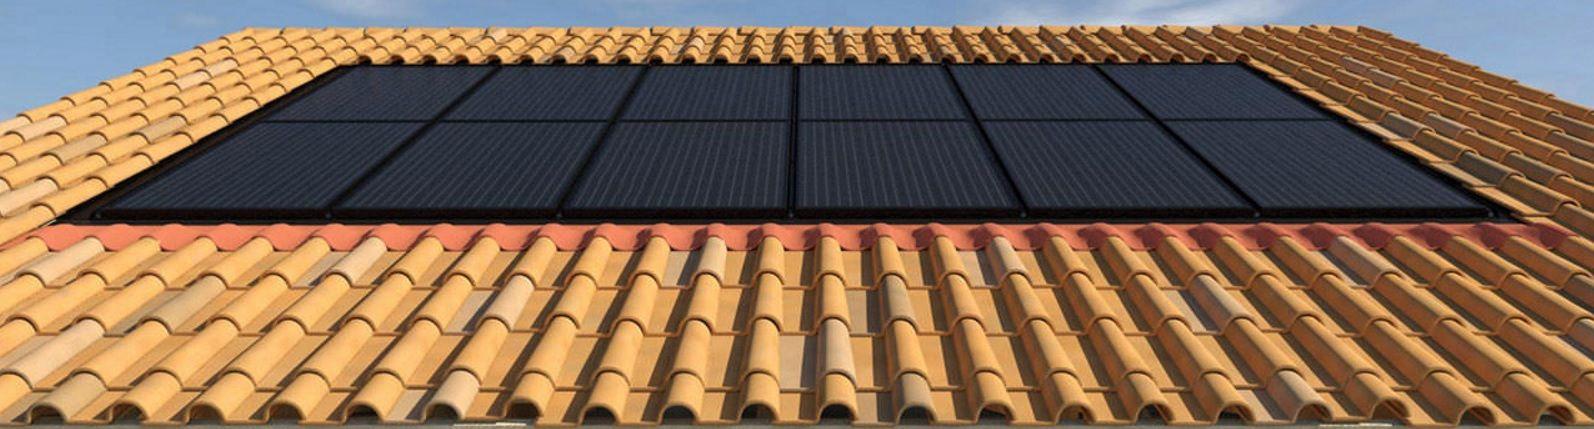 panel-fotovoltaico-termico-hibrido